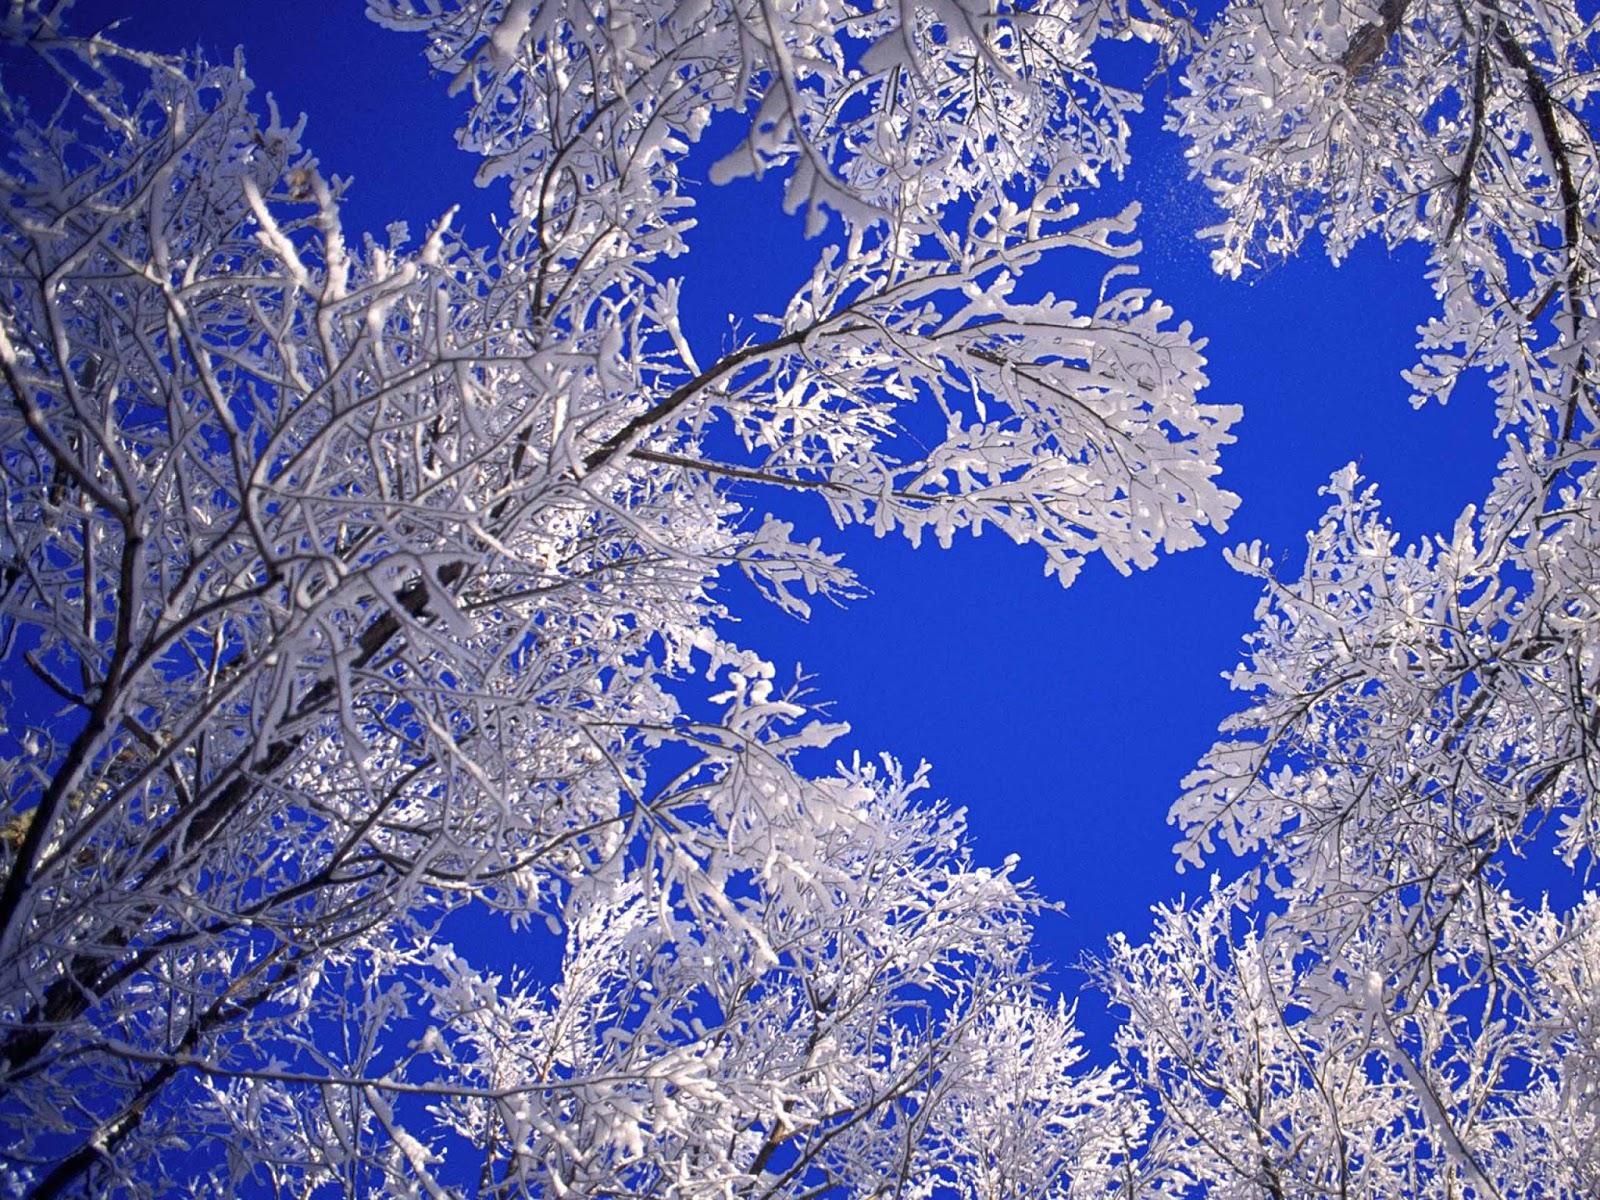 winter computer wallpaper,blue,frost,winter,freezing,branch